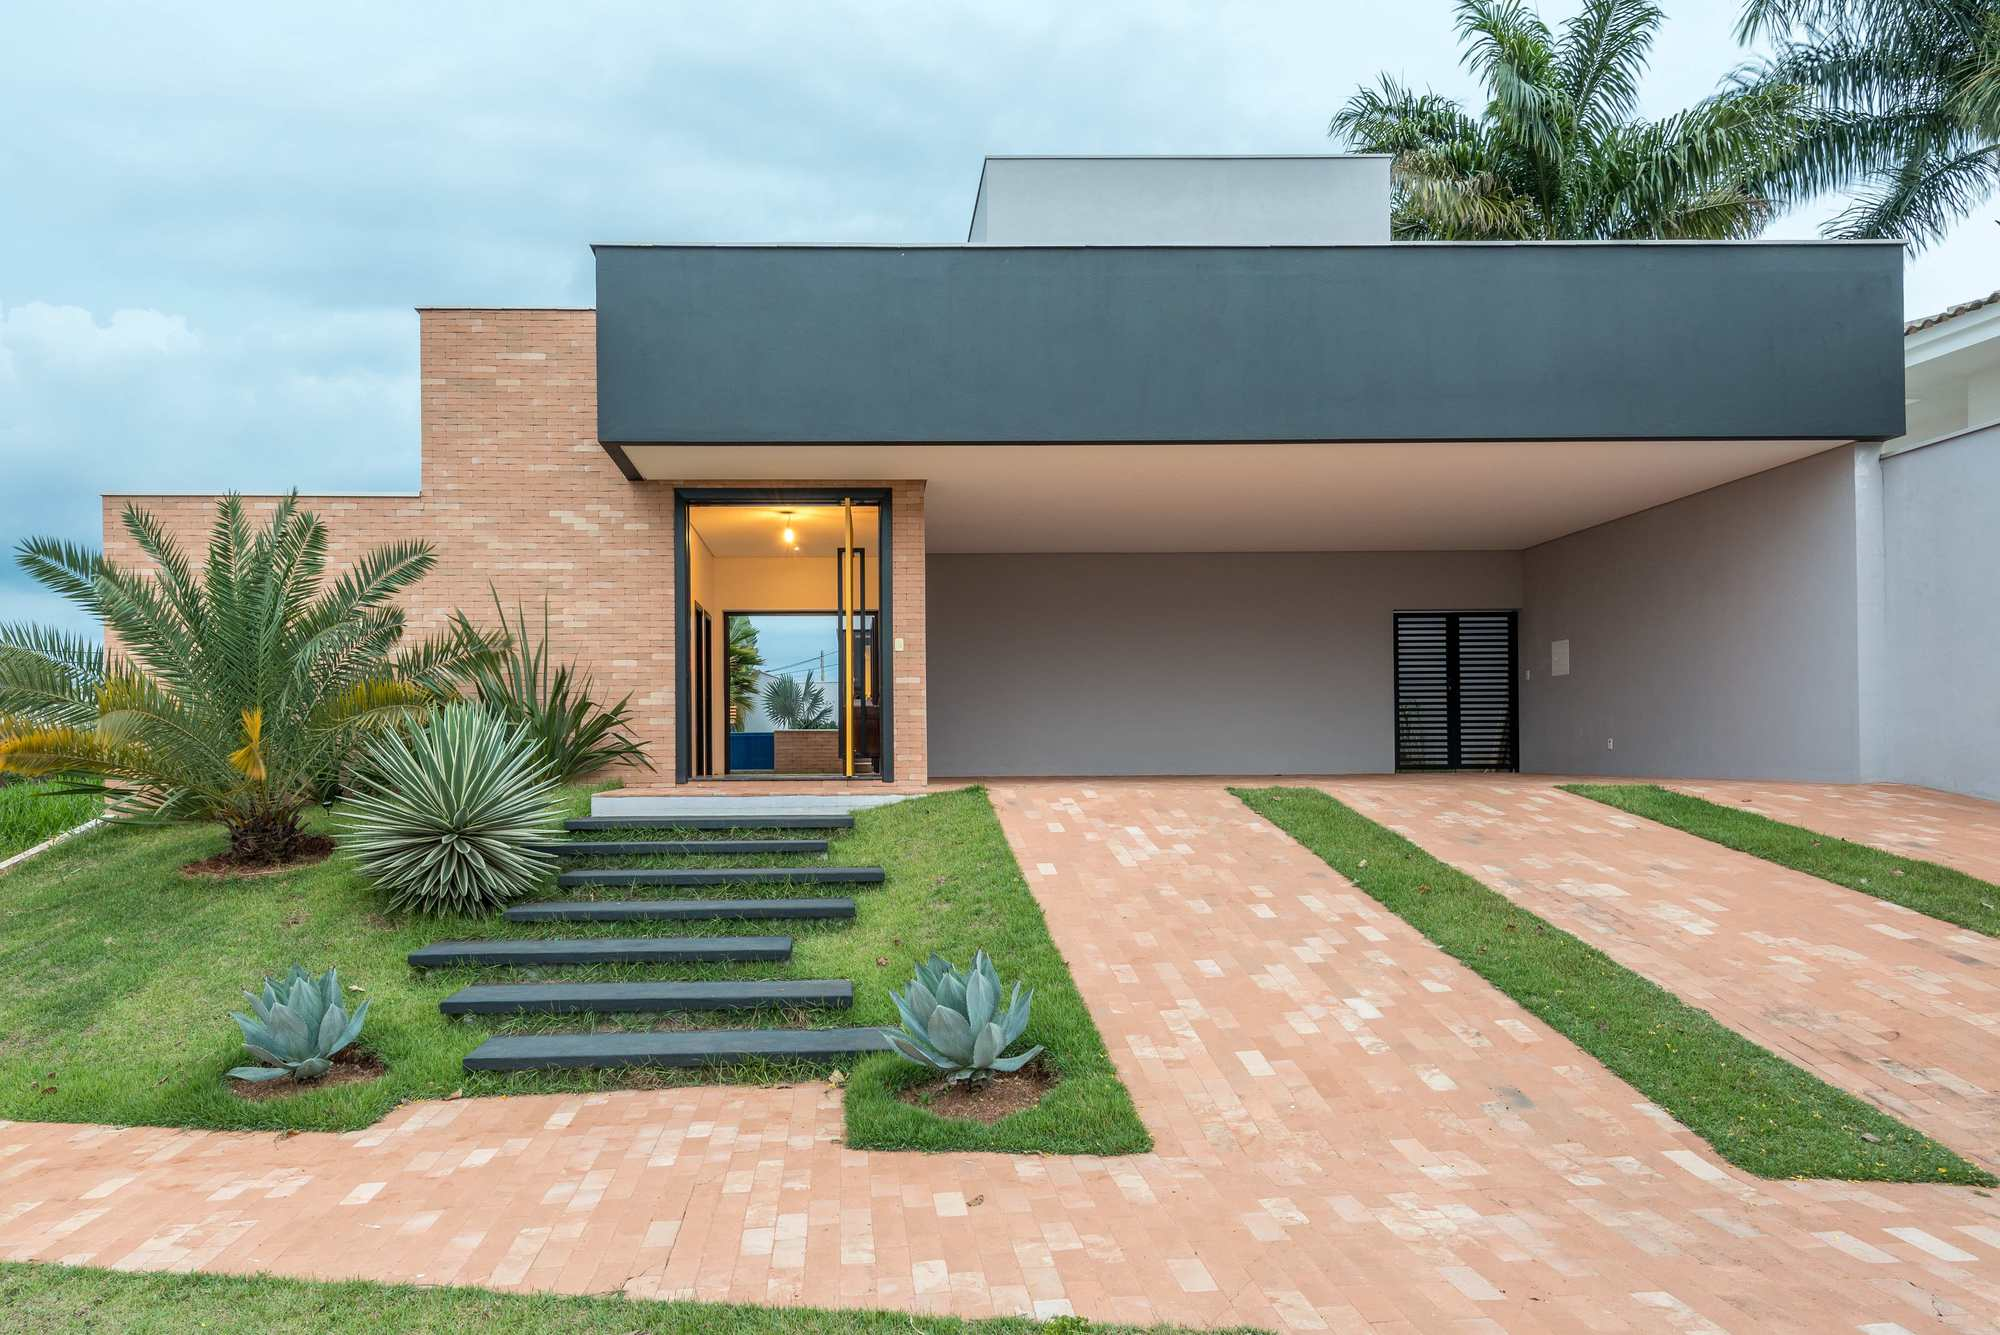 Casa cb laje 54 arquitetura archdaily brasil for Modelos de casas procrear clasica